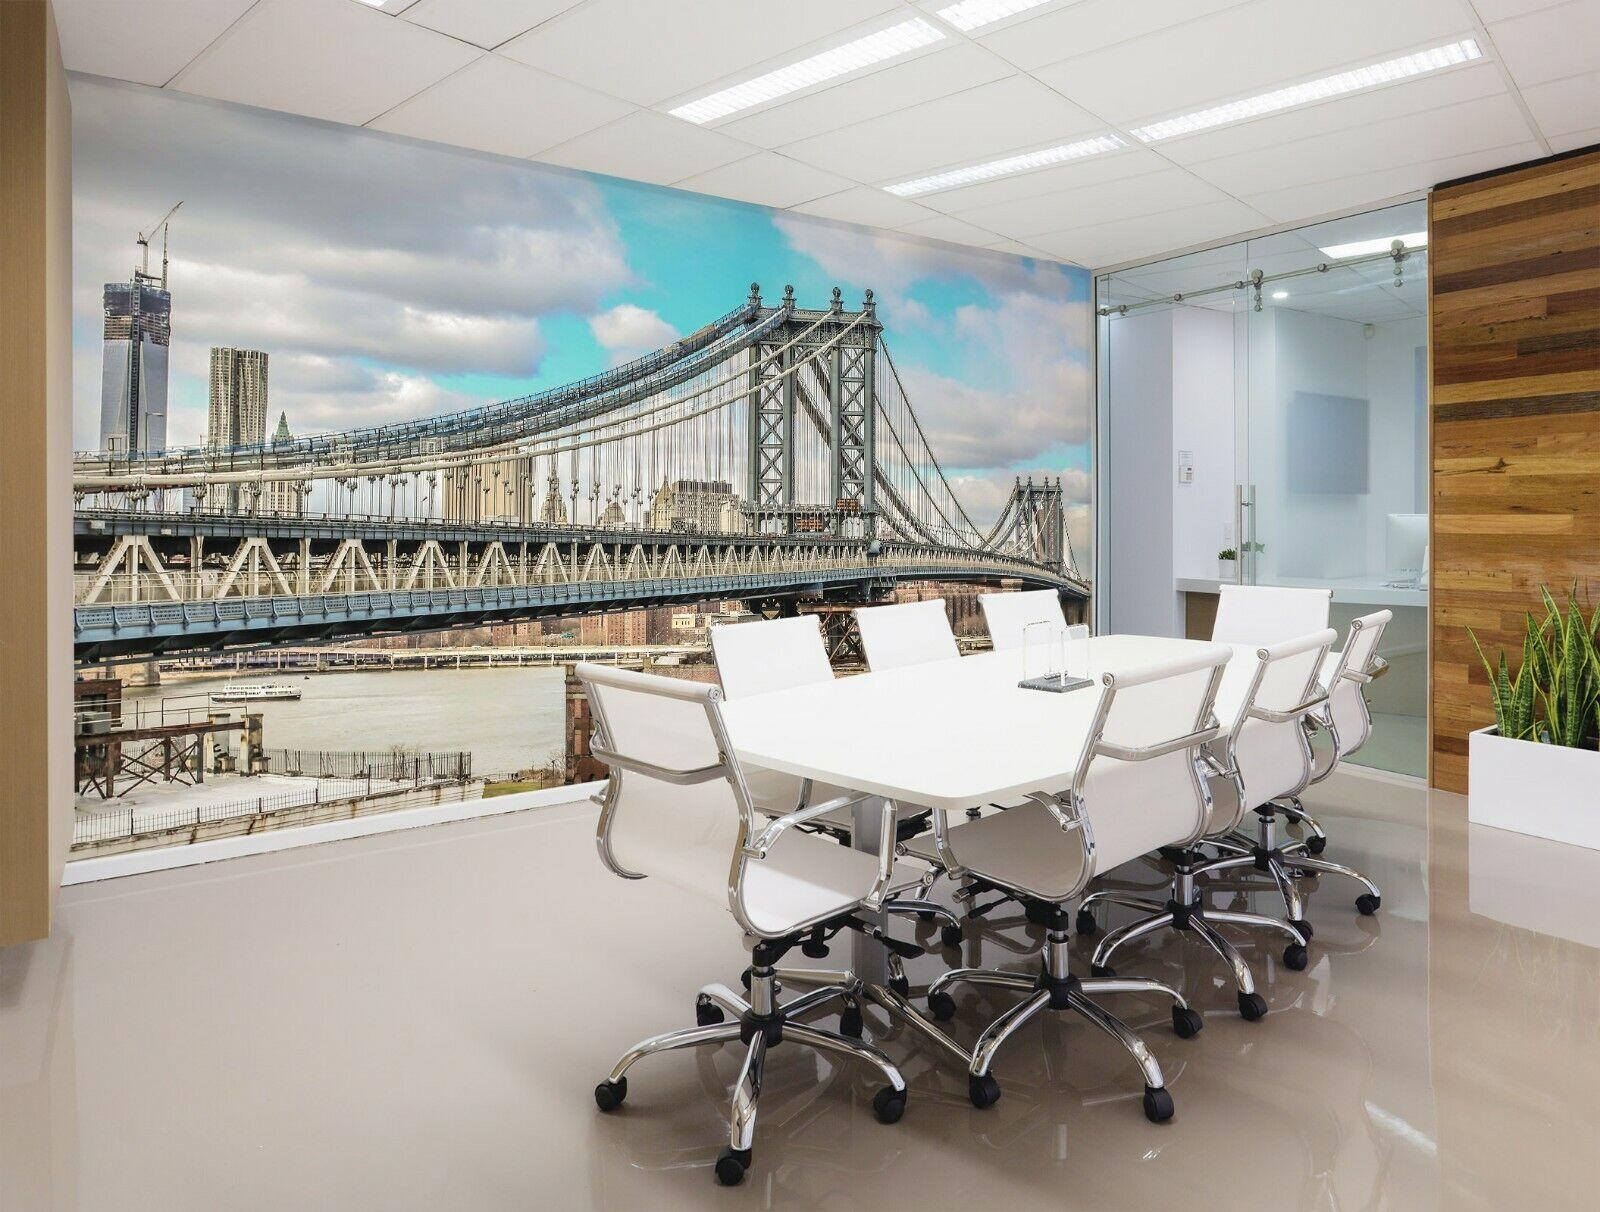 3D Stadt Brücke M80 Geschäft Tapete Wandgemälde Selbstklebend Handel An